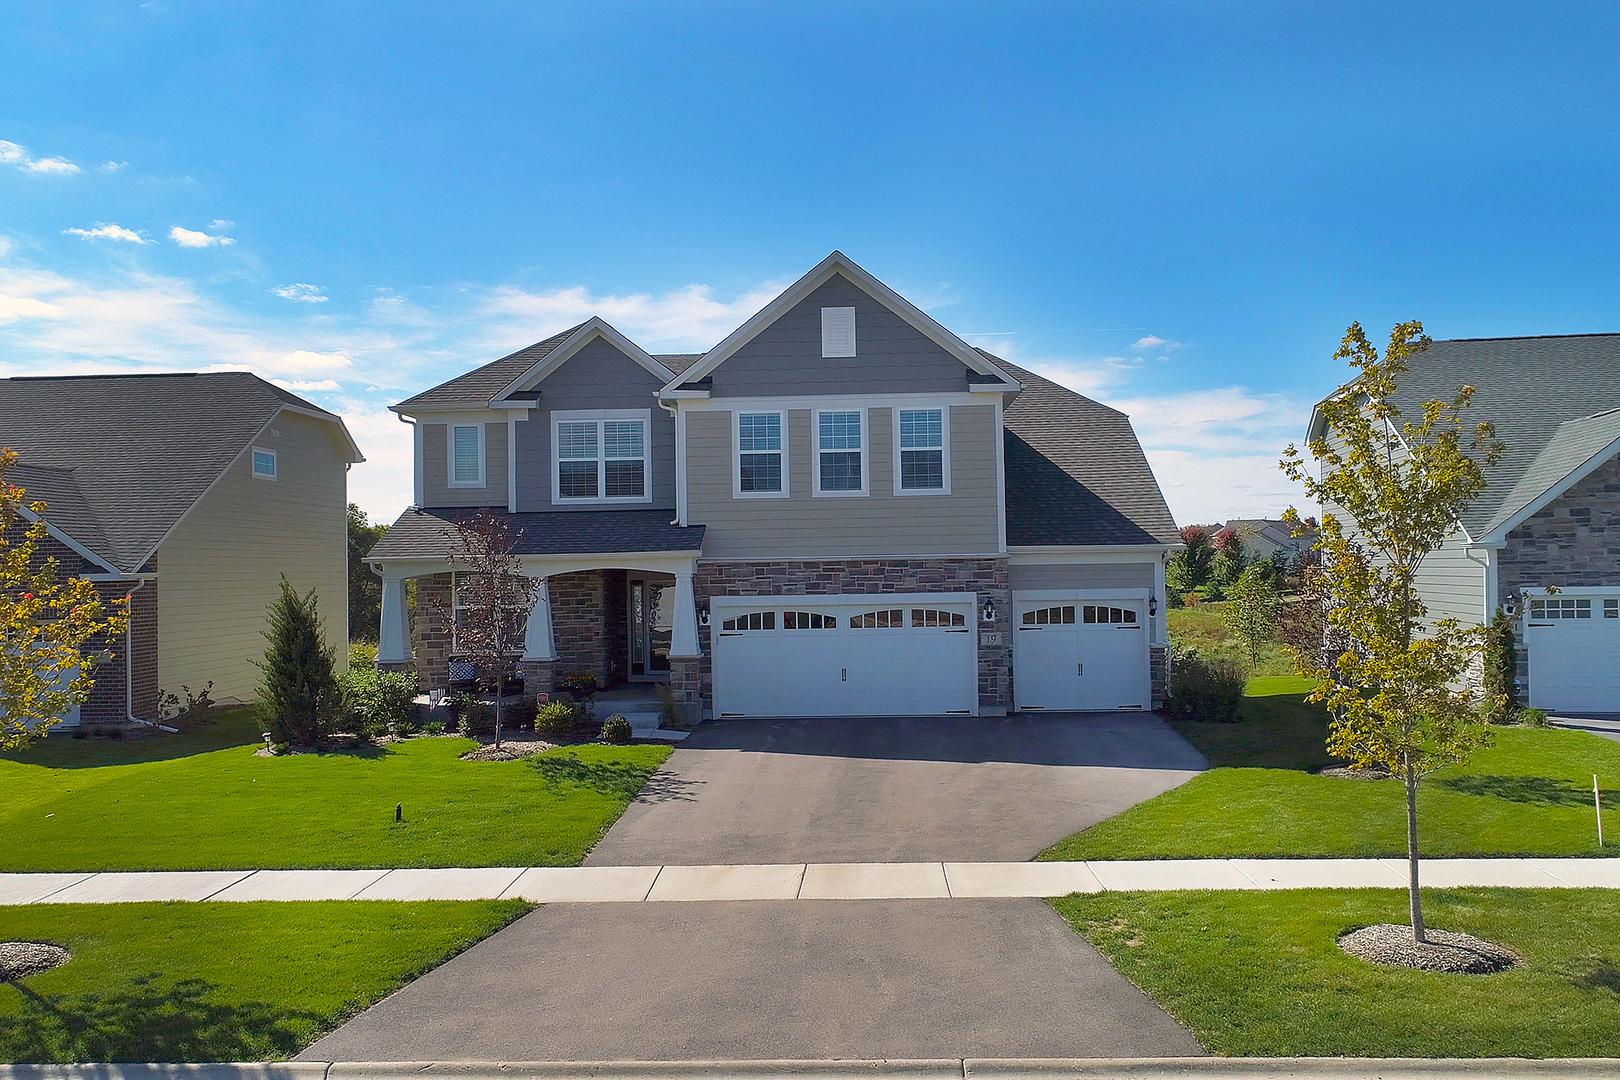 19 Andrew Lane, Hawthorn Woods, Illinois 60047